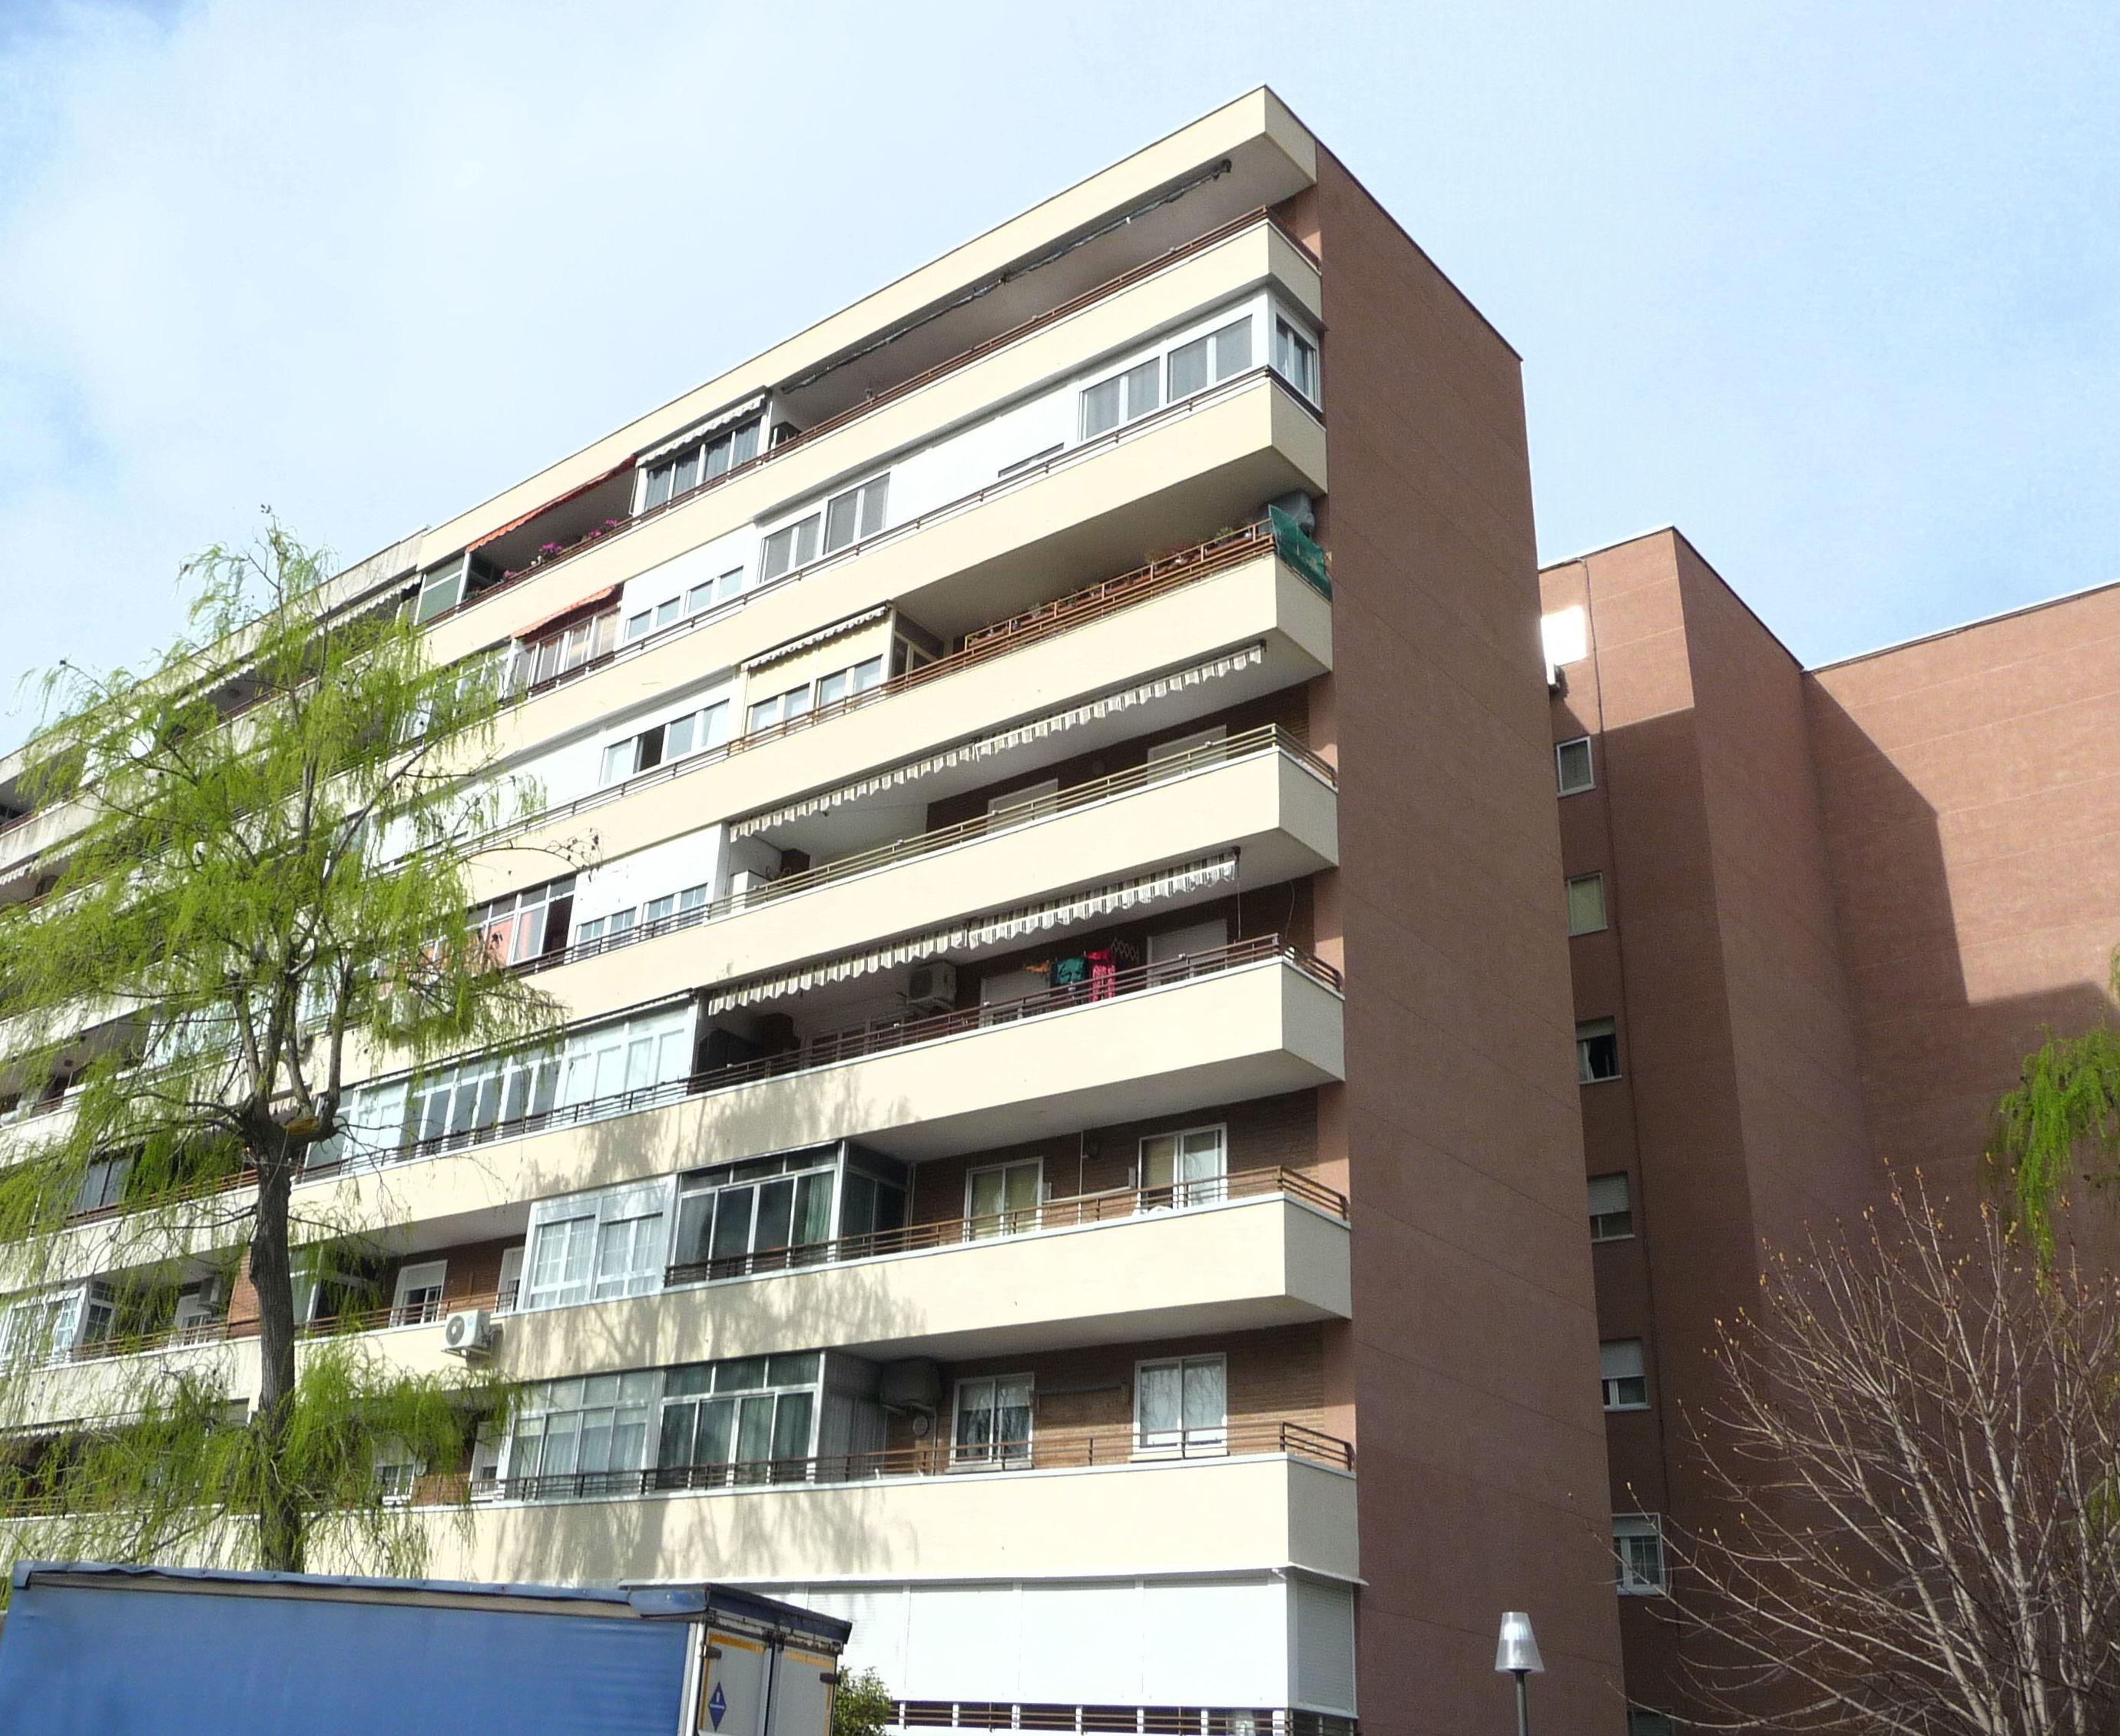 Edificios madrid edificios ms altos de madrid the for Oficina mapfre fuenlabrada